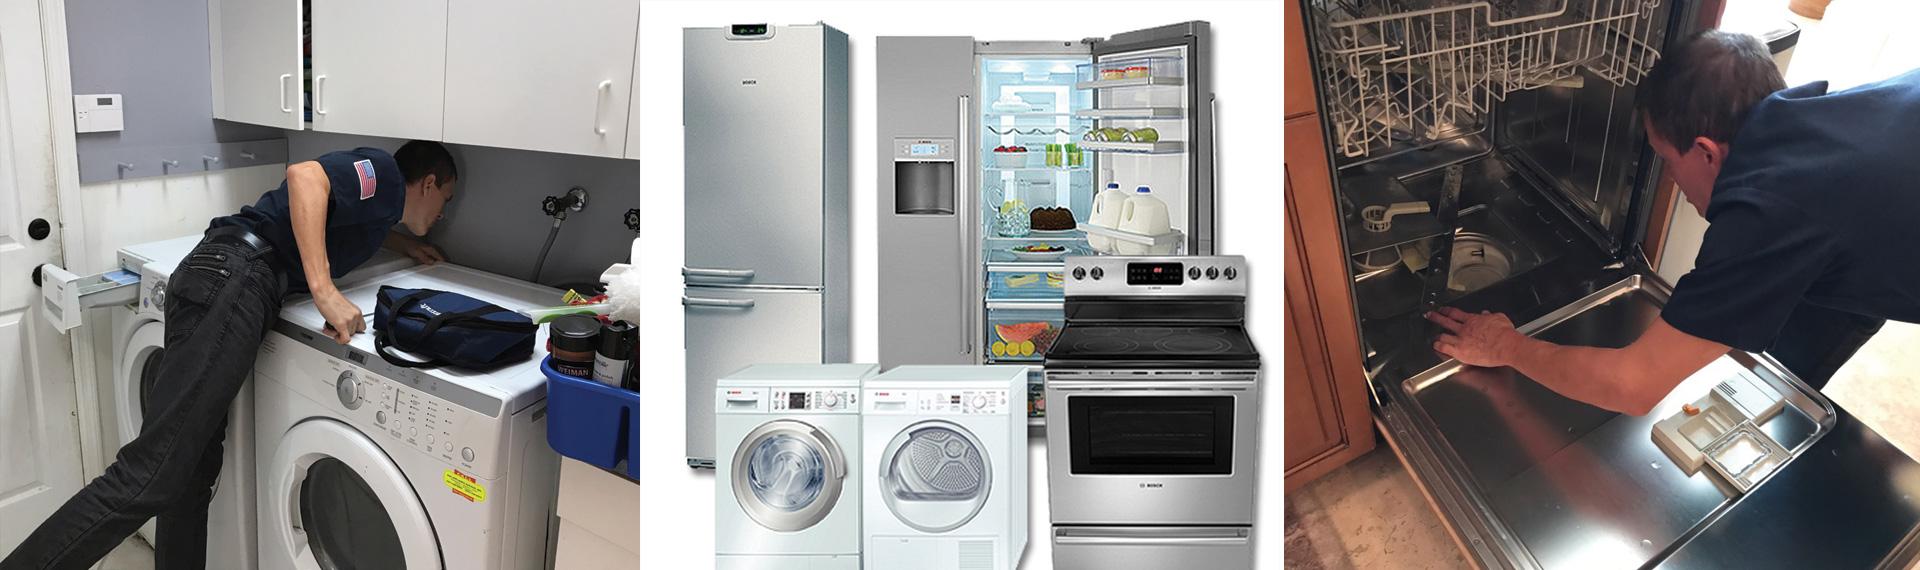 1A Appliance Service Miami Beach FL